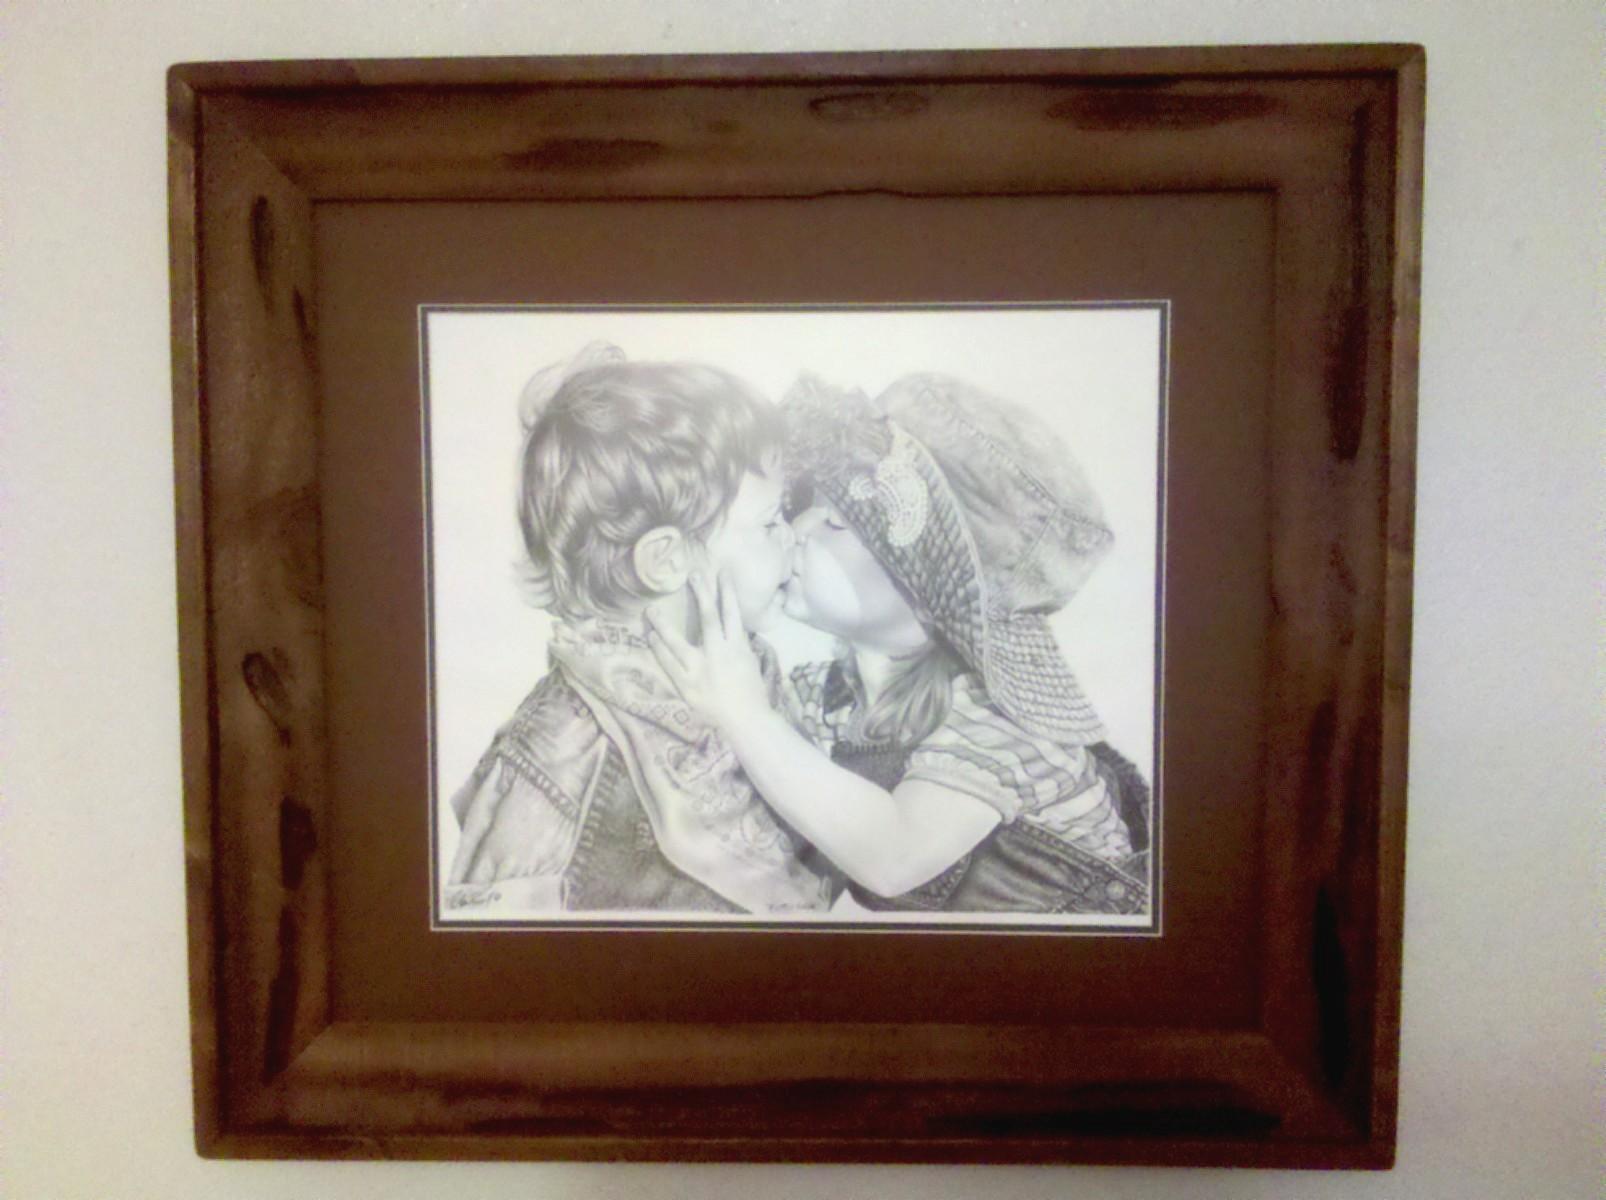 Rustic Cedar Framing Hand Crafted by Glen Powell